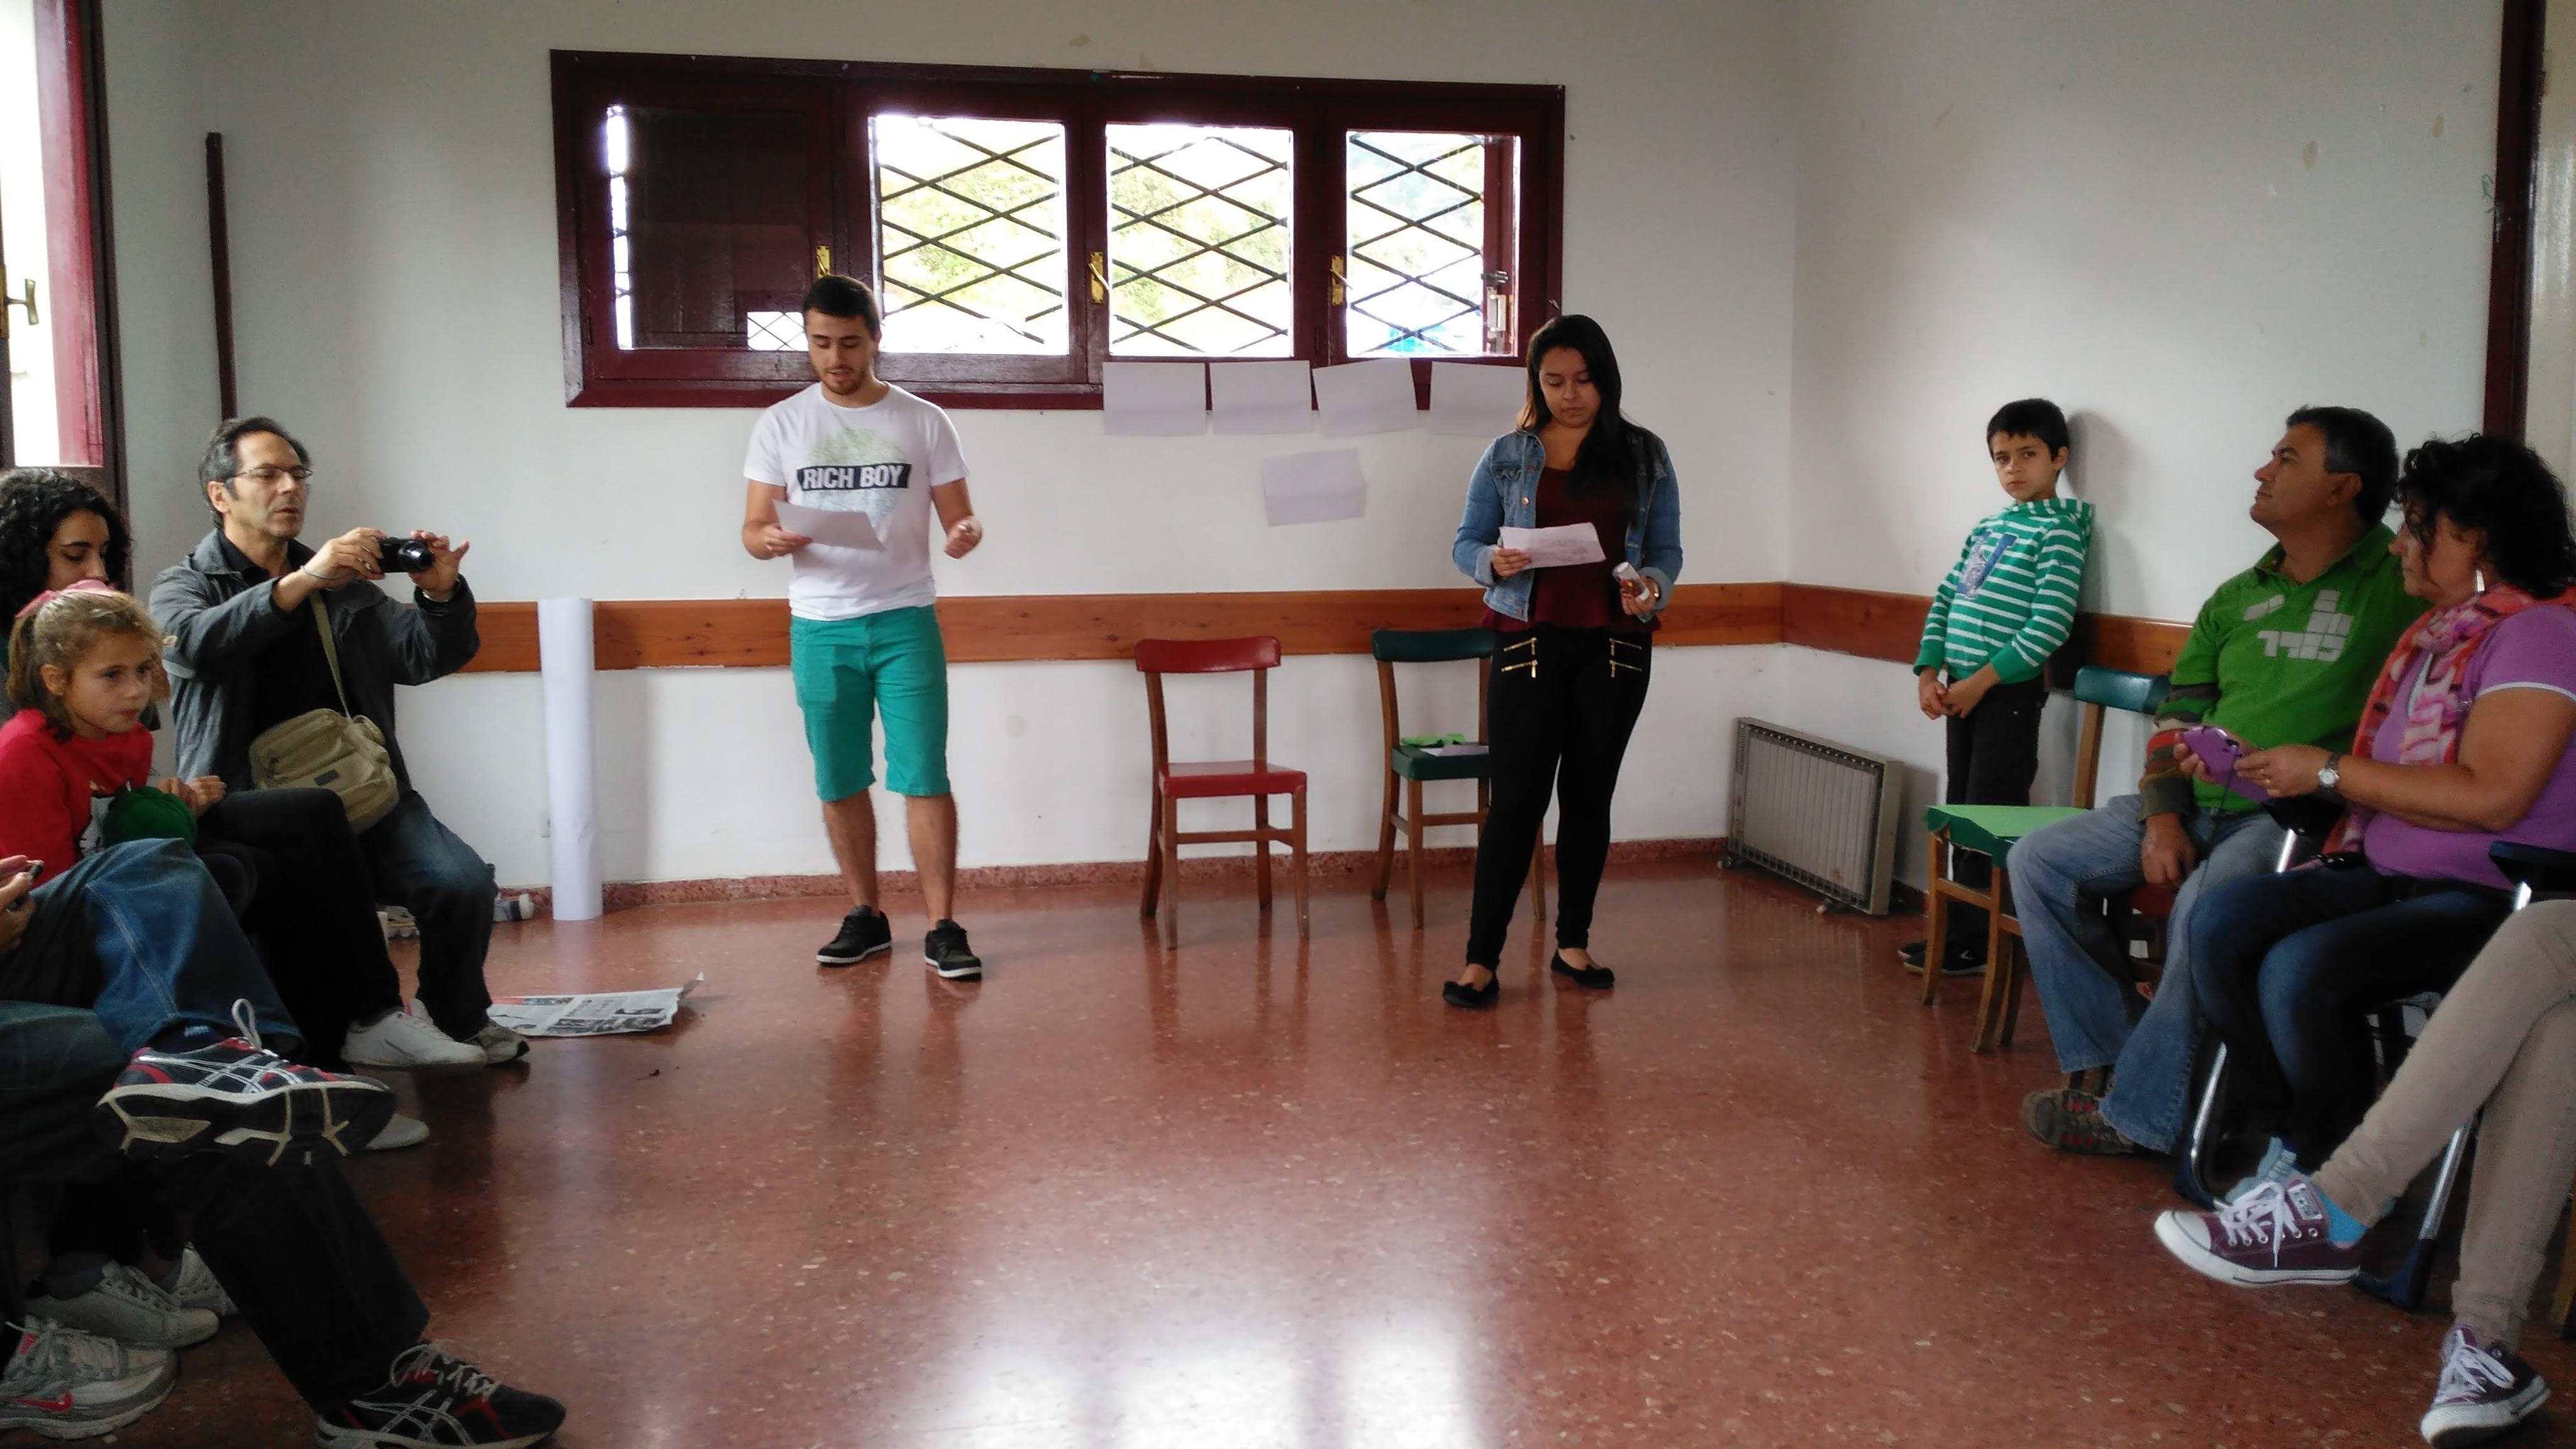 Picasa - 2015.09.12-13 - Convivencia Sector Familias(4).jpg